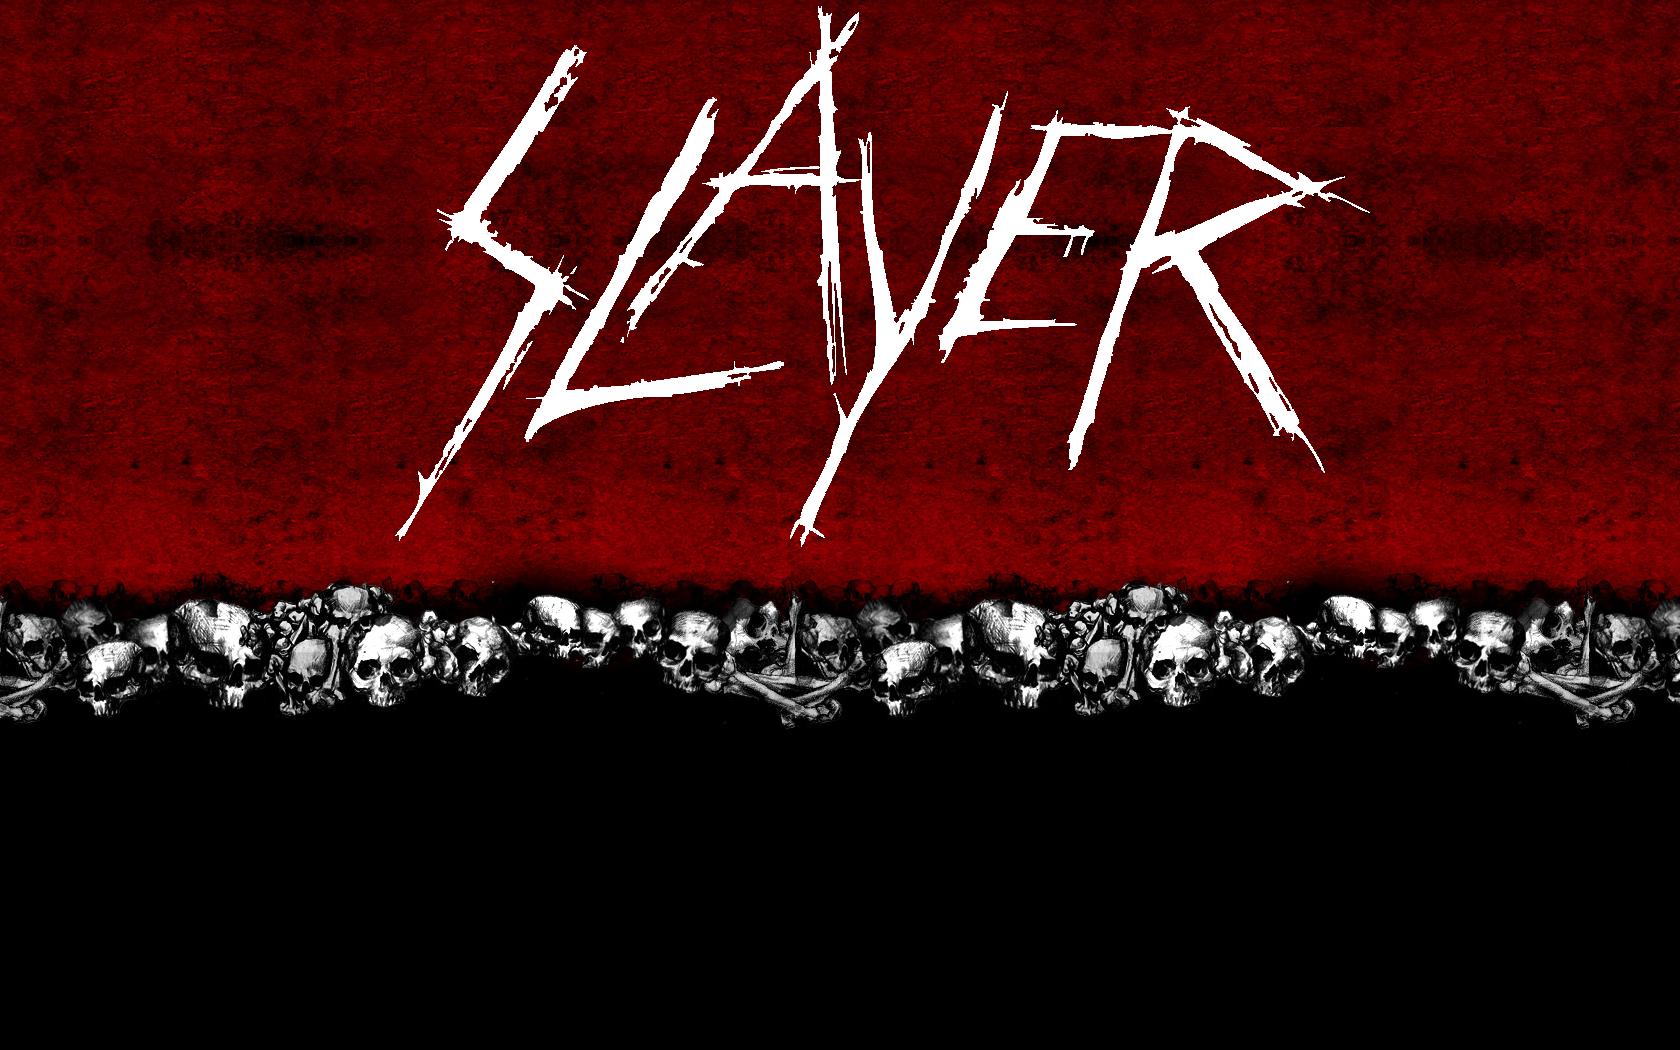 Slayer Band Wallpapers 1680x1050